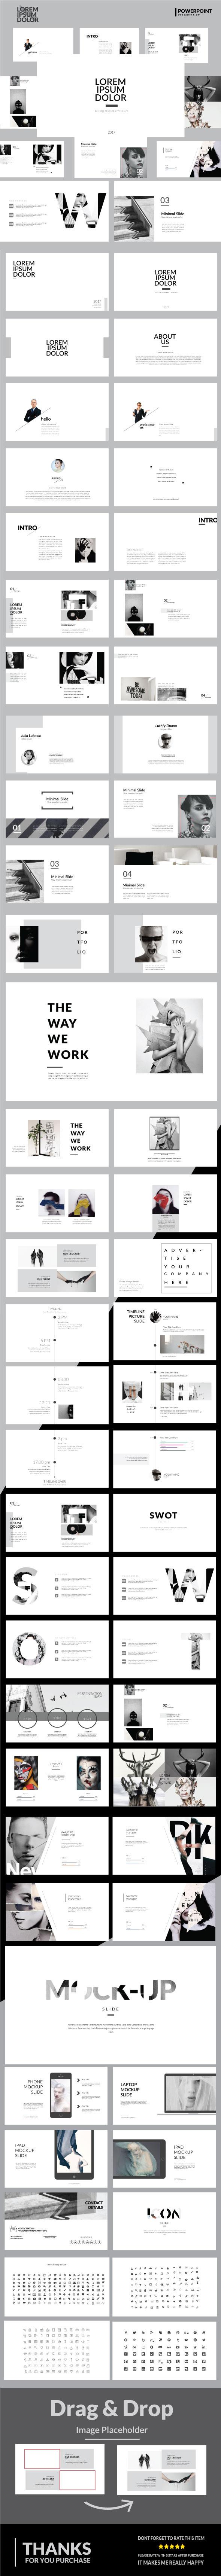 Lorem Ipsum Dolor - Multipurpose Powerpoint Template - Business PowerPoint Templates